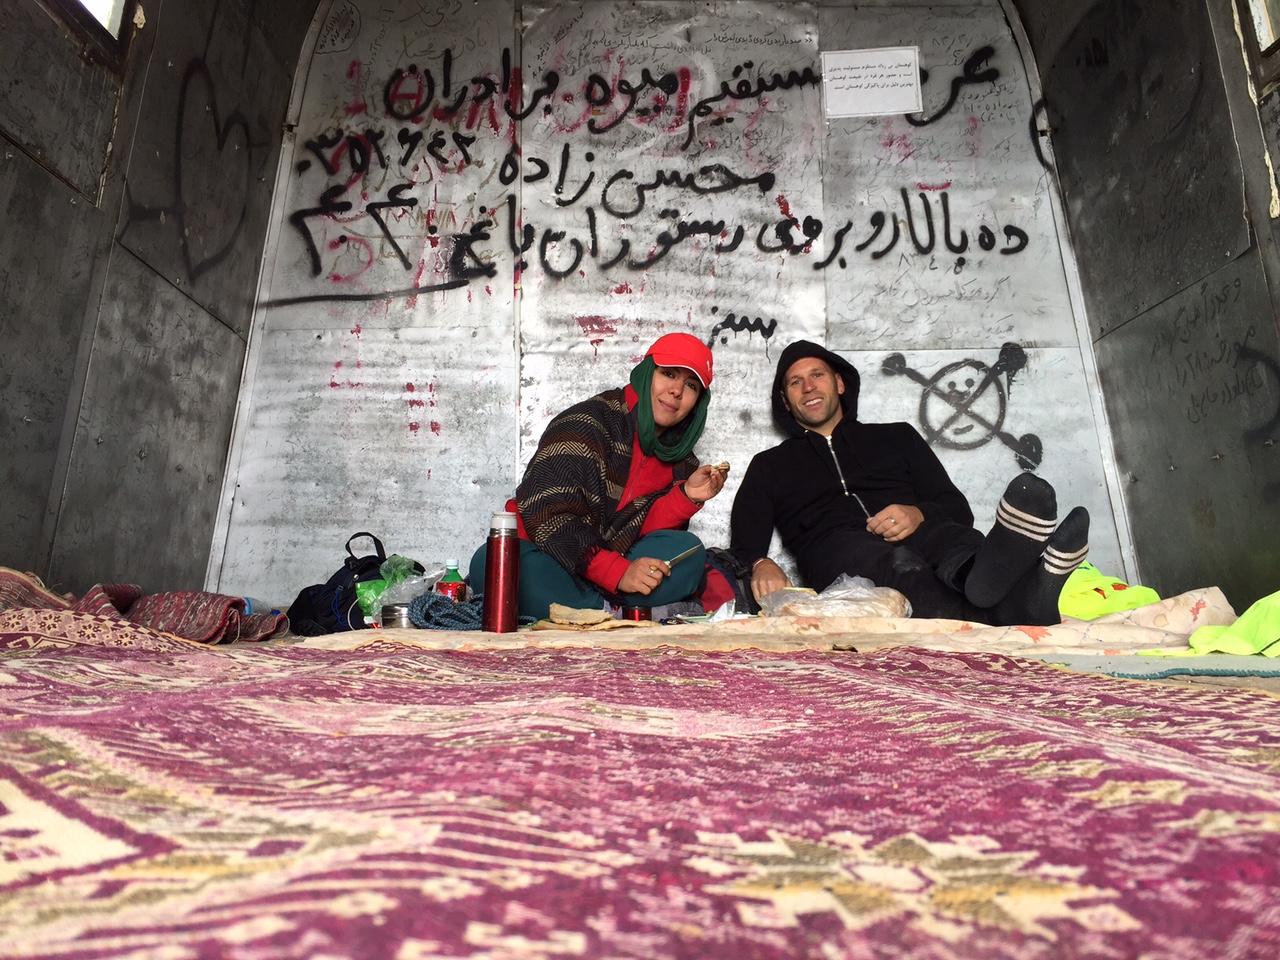 Peter Santenello and his guide in Iran